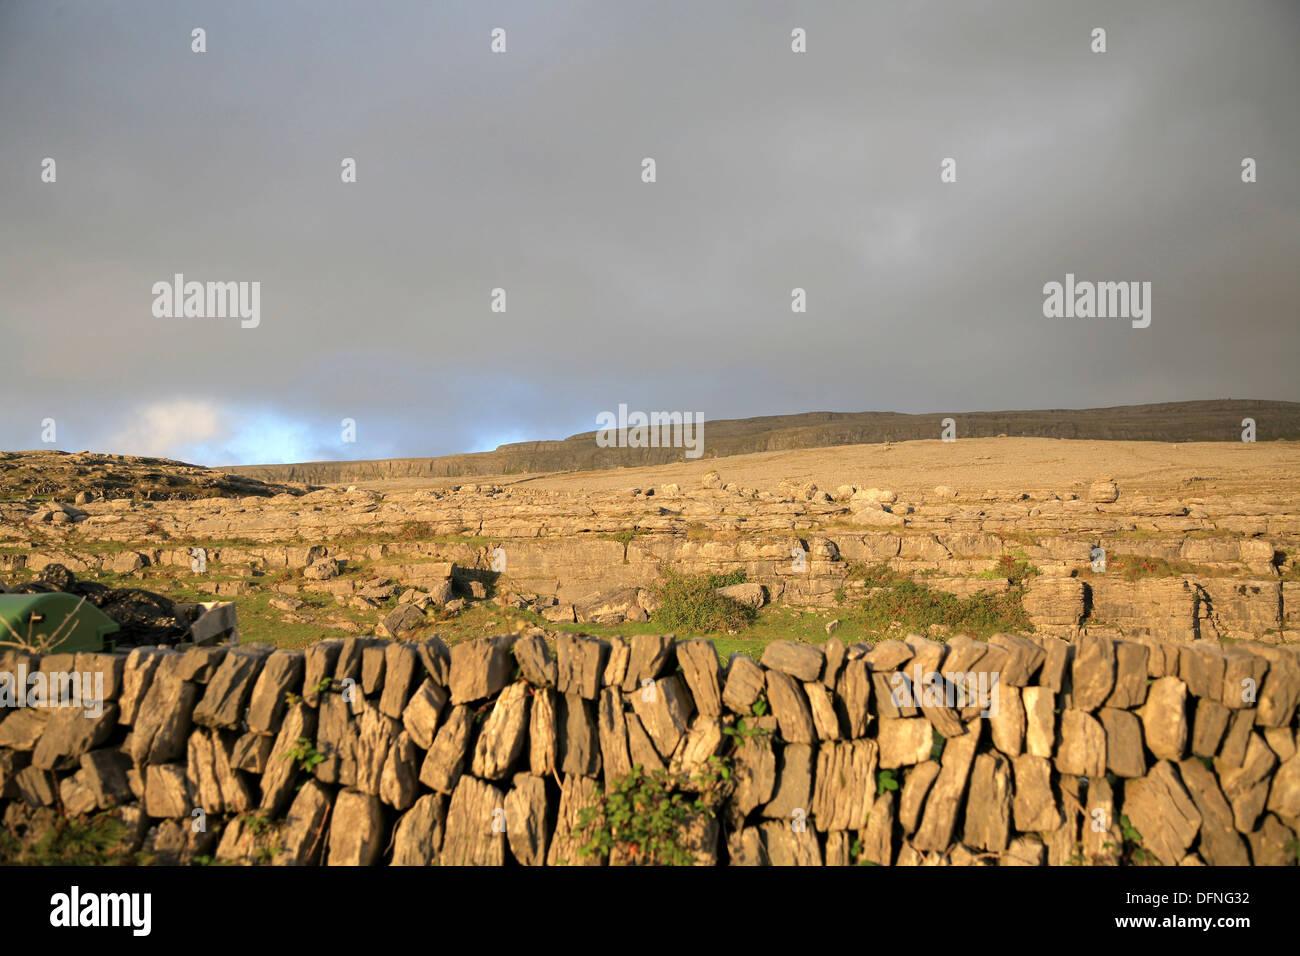 The Burren landscape, Co Clare, Ireland, Europe - Stock Image